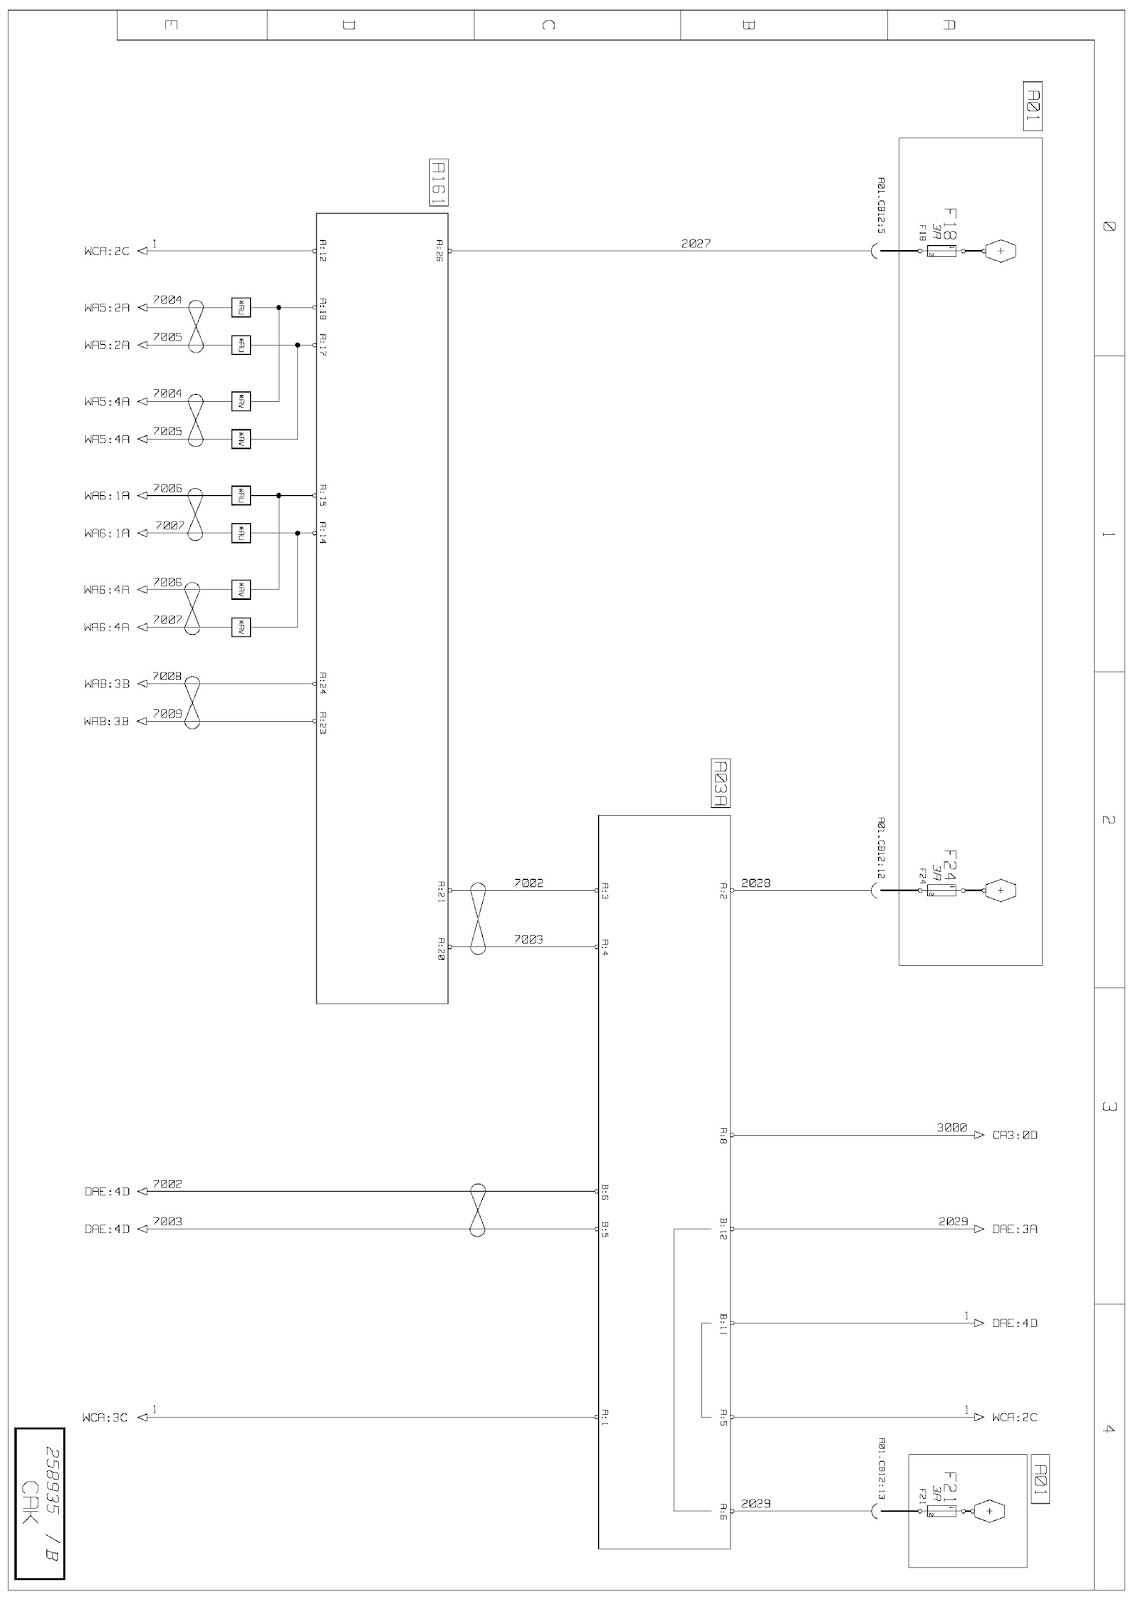 wiring diagrams renault trucks t euro virenault truck wiring diagram 3 [ 1133 x 1600 Pixel ]